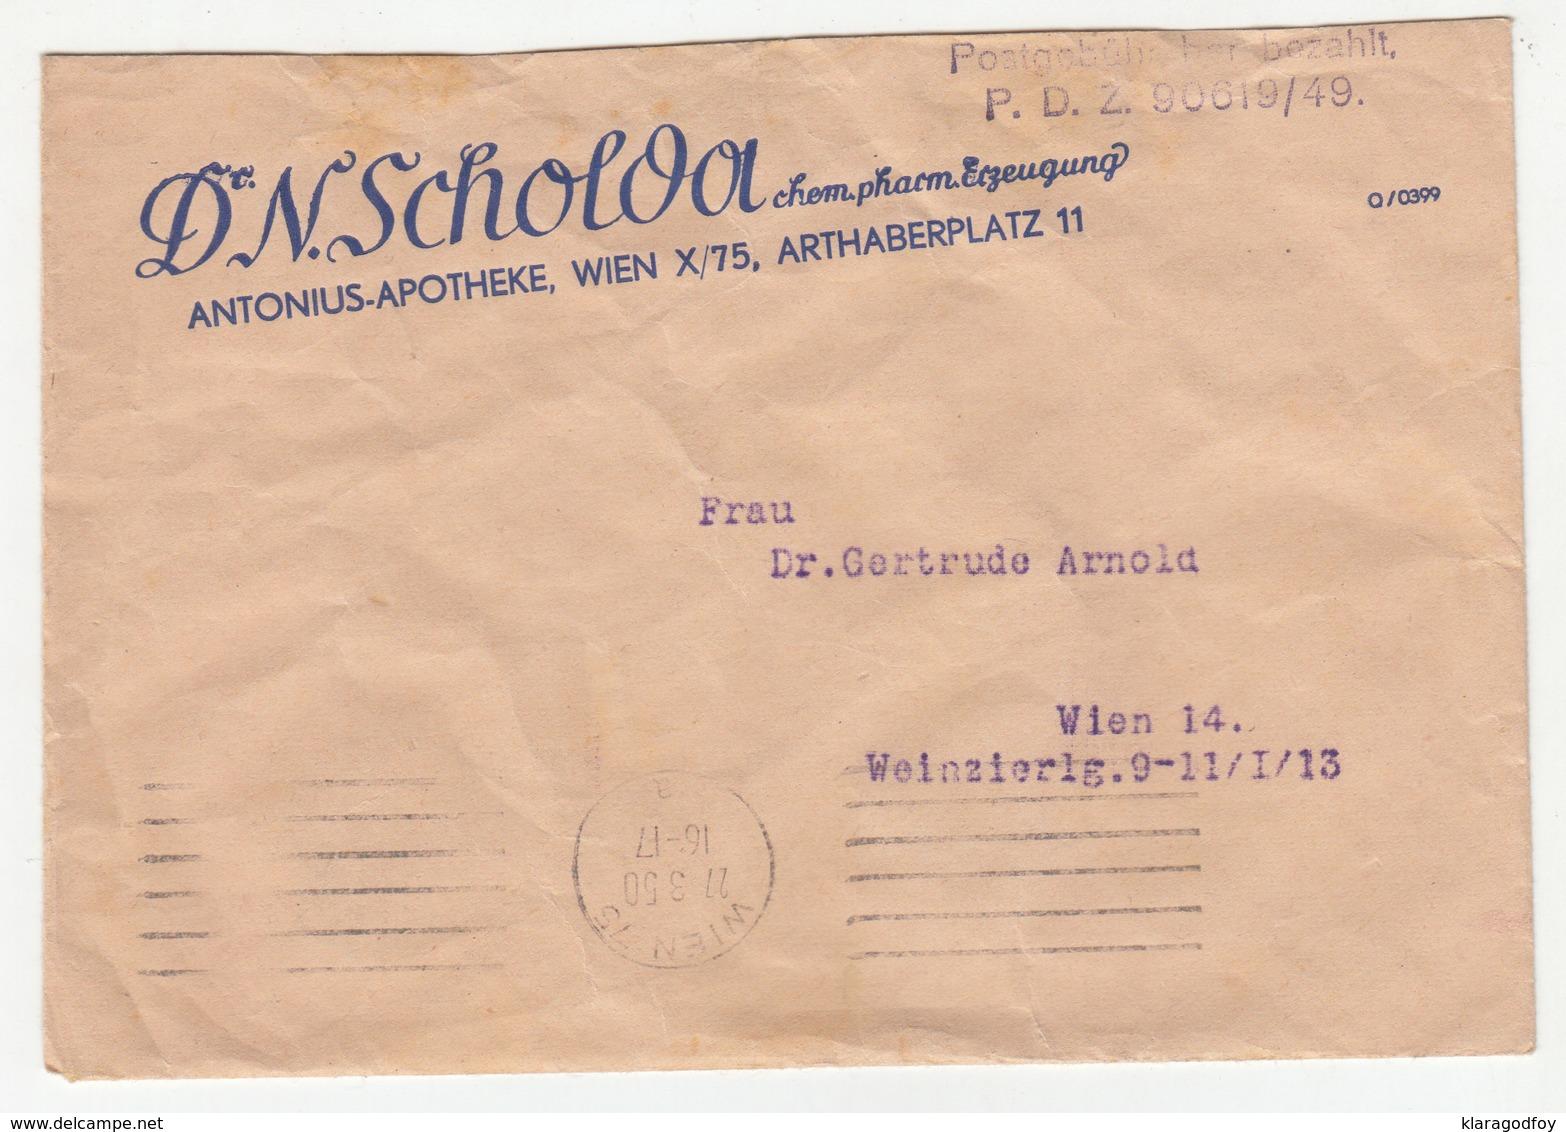 Austria, Dr. N. Scholda Apotheke Company Letter Cover Travelled 1950 B181001 - 1945-1992 Socialist Federal Republic Of Yugoslavia